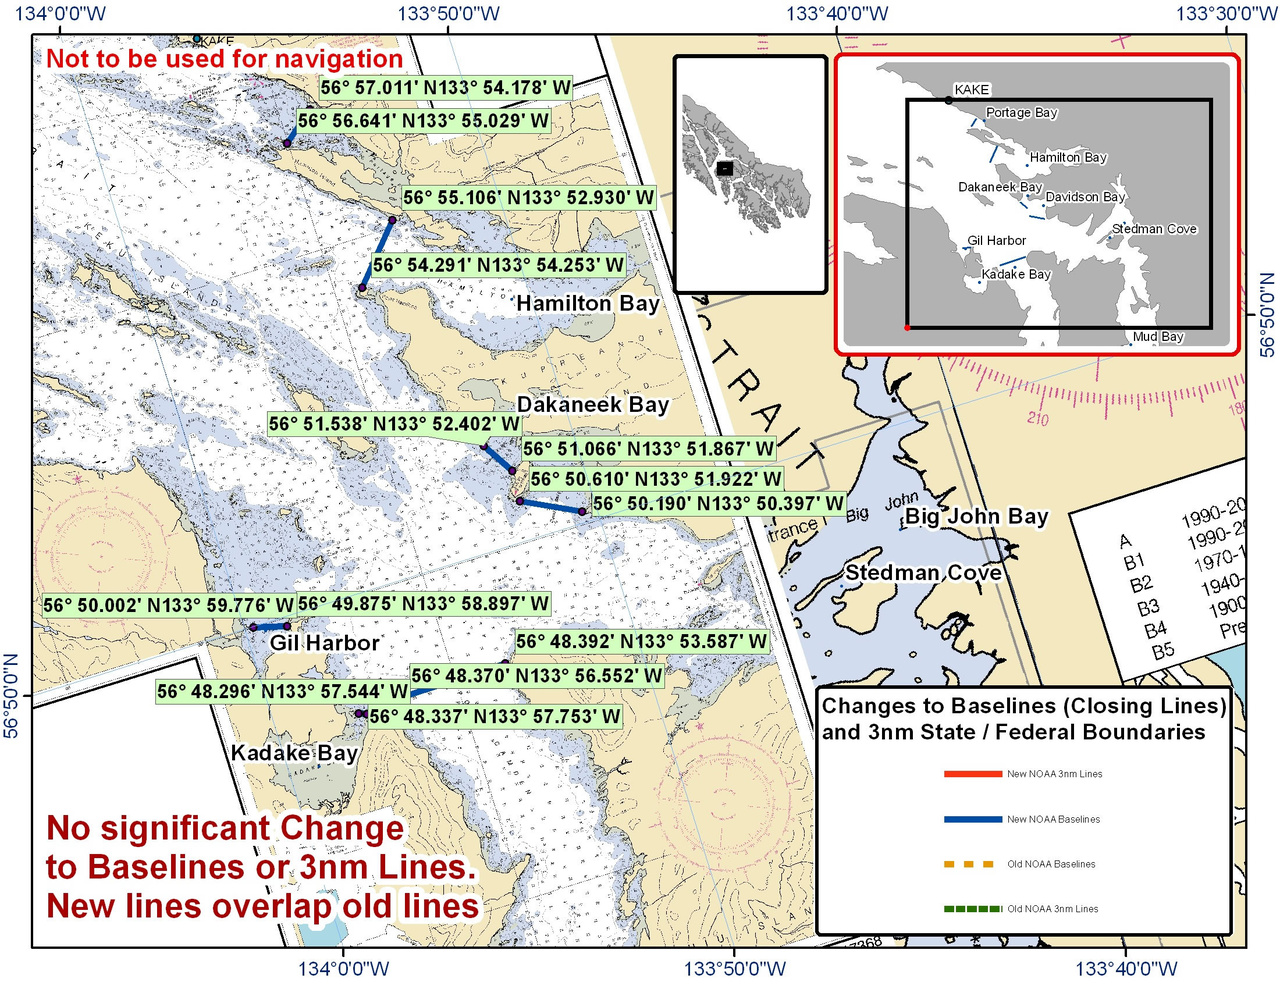 Chart for Dakaneek Bay and the Surrounding Bay